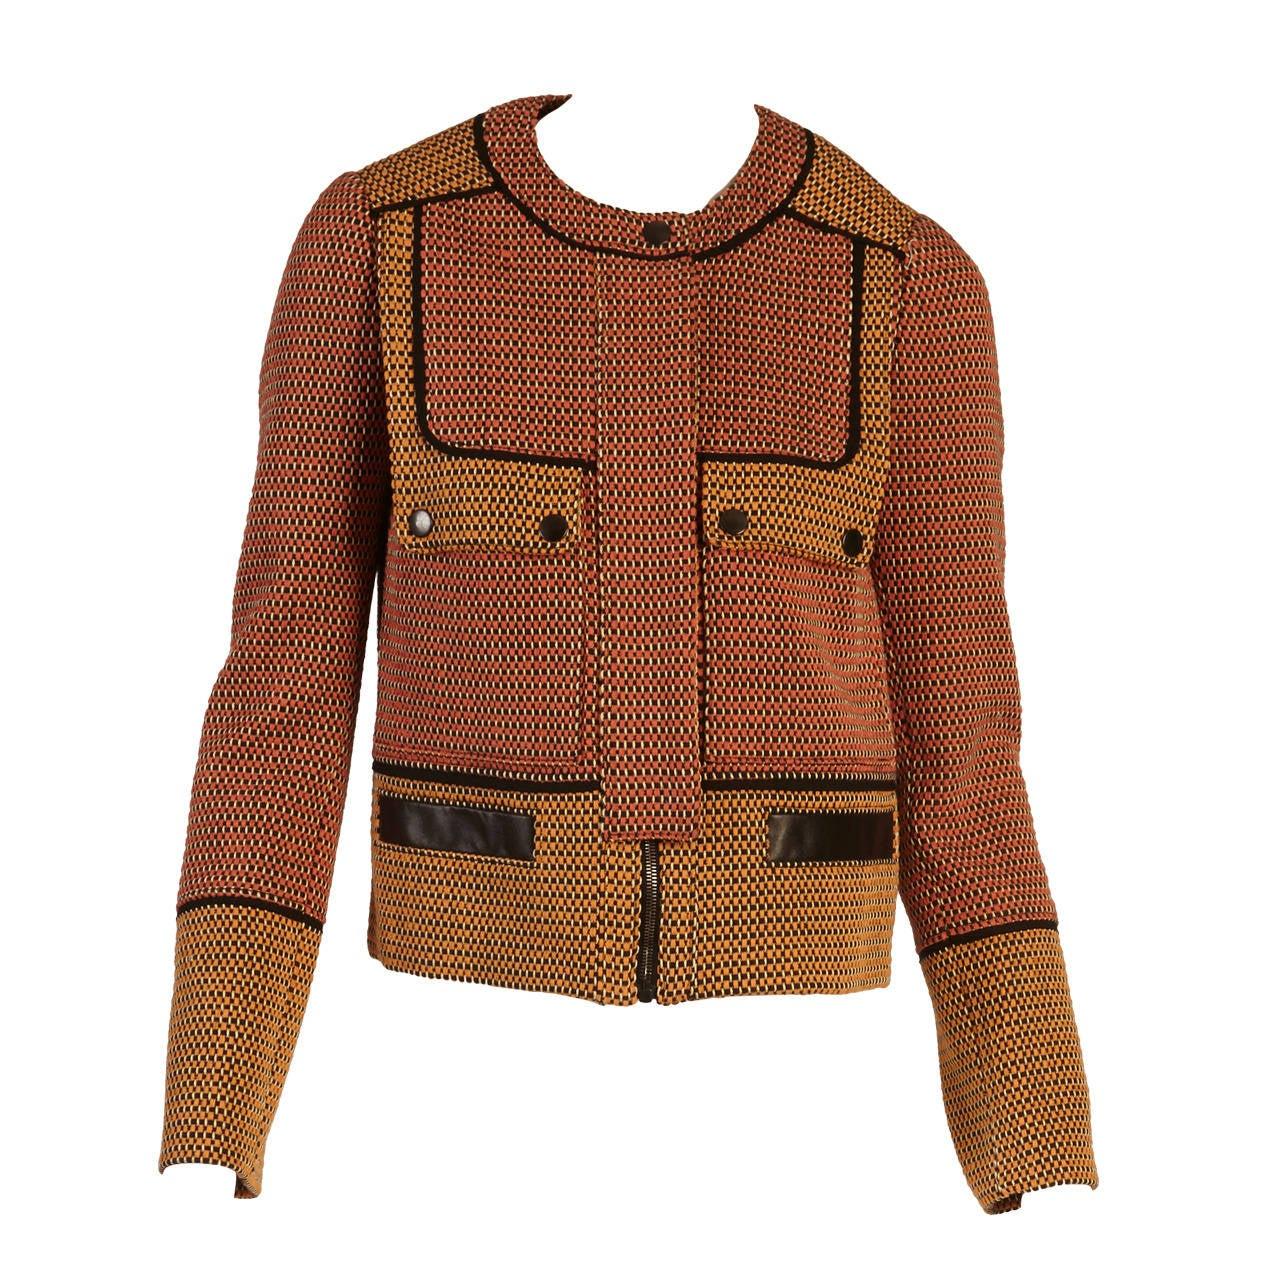 Proenza Schouler Multi-Color Jacket 1